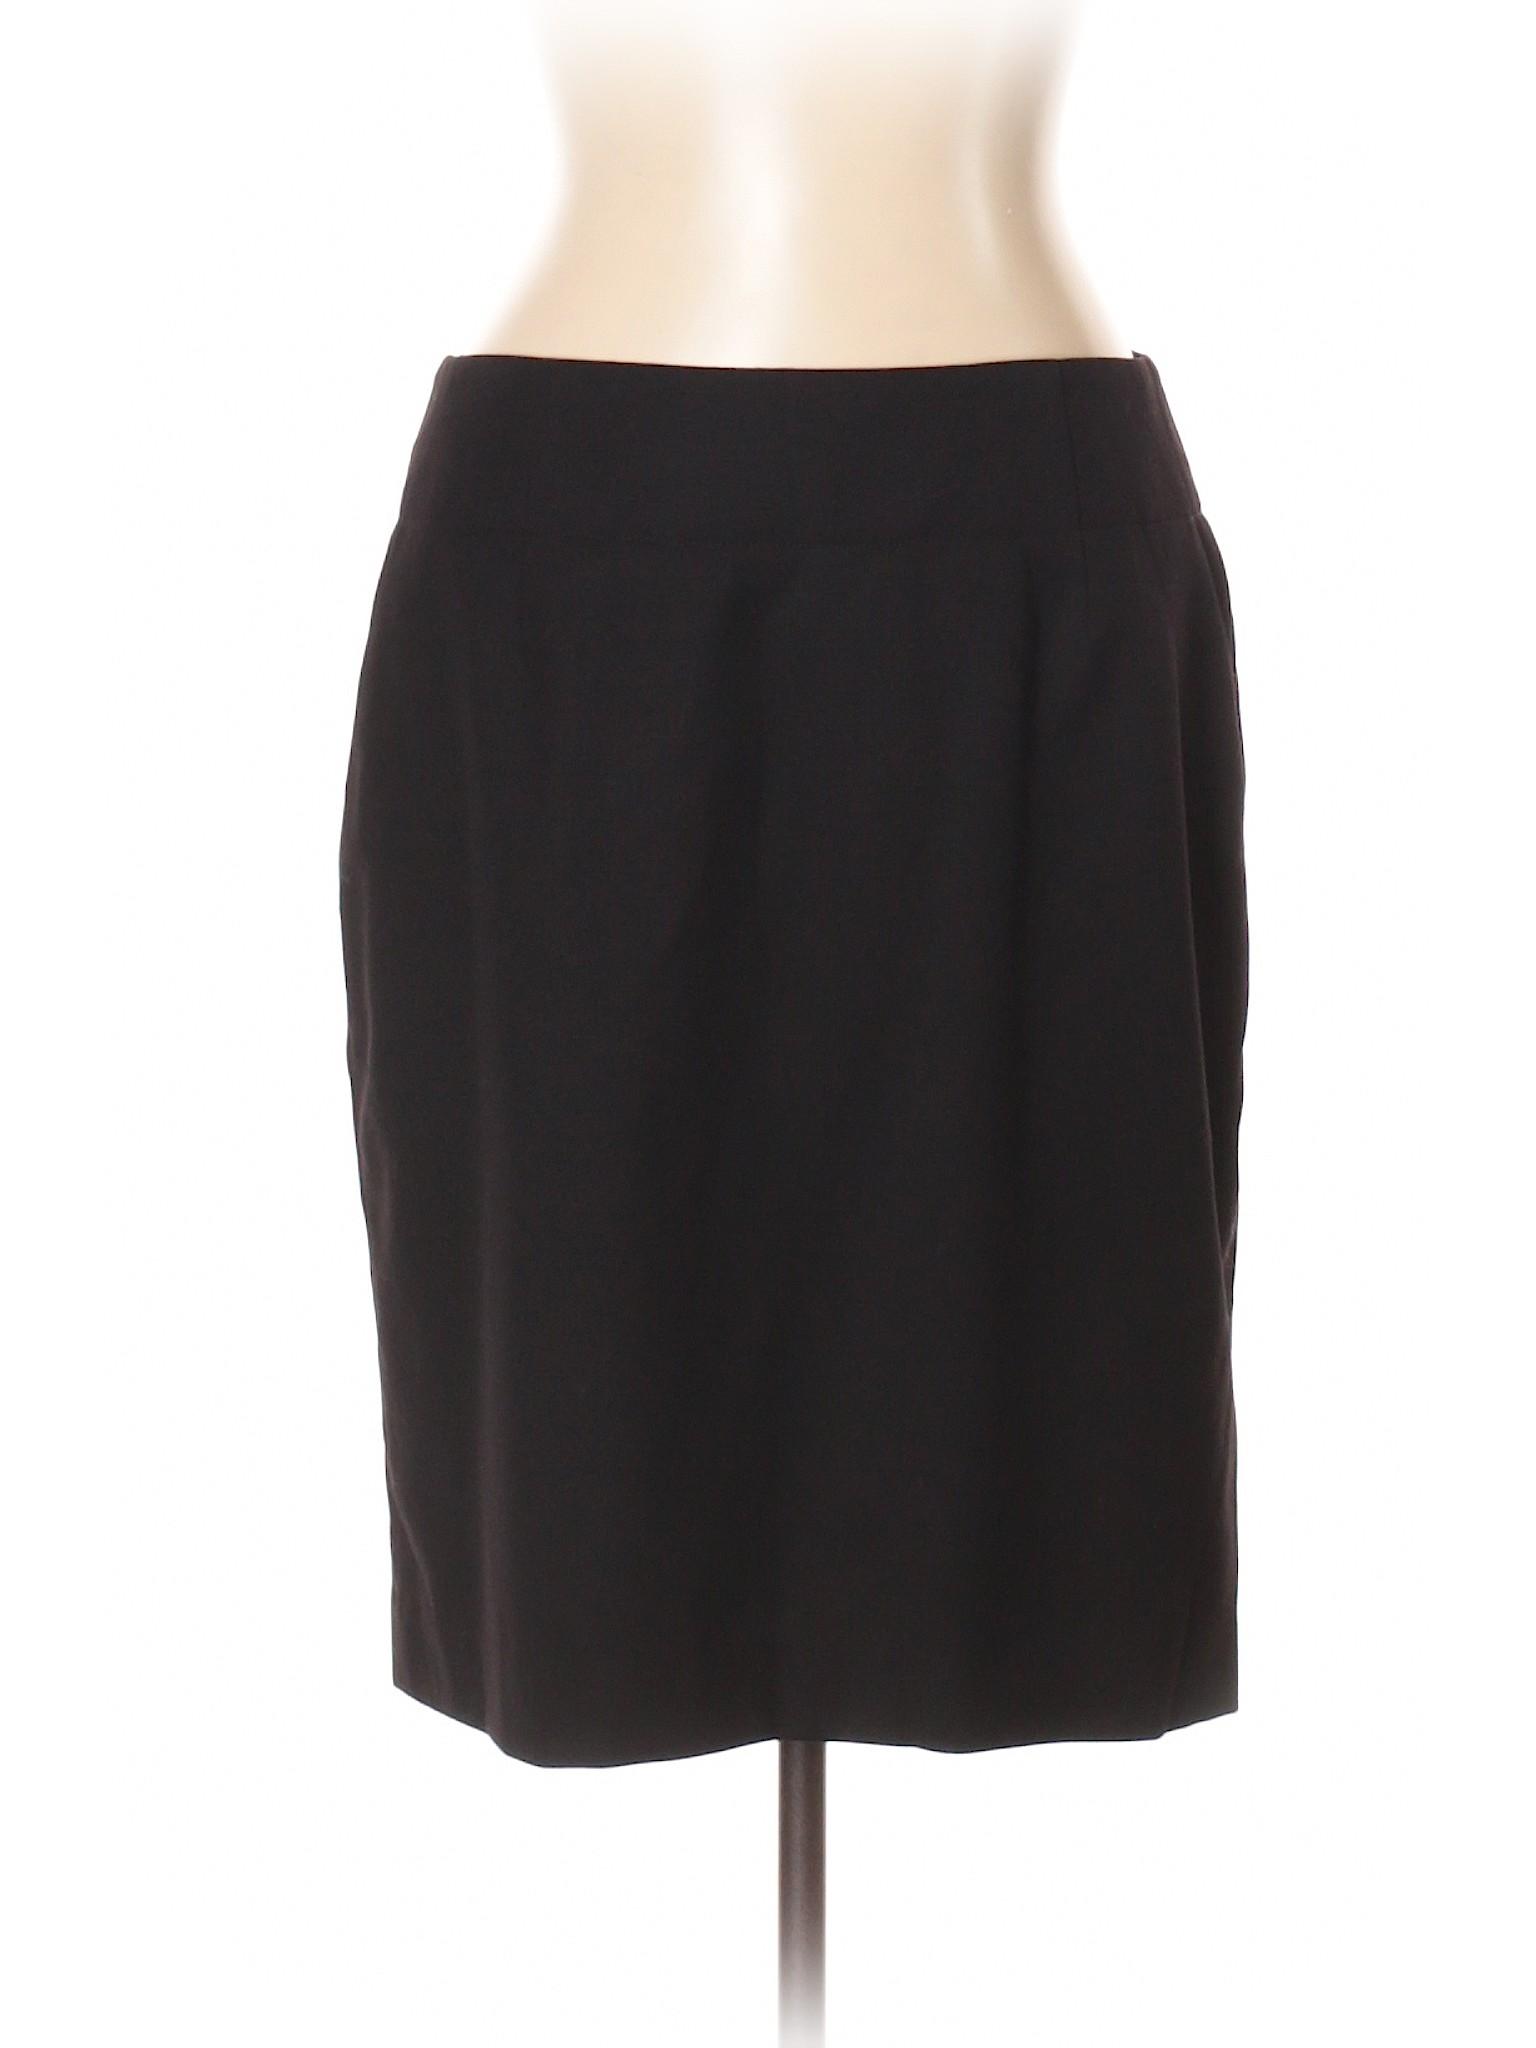 Banana Skirt Boutique Wool Republic leisure Fn8xaqH